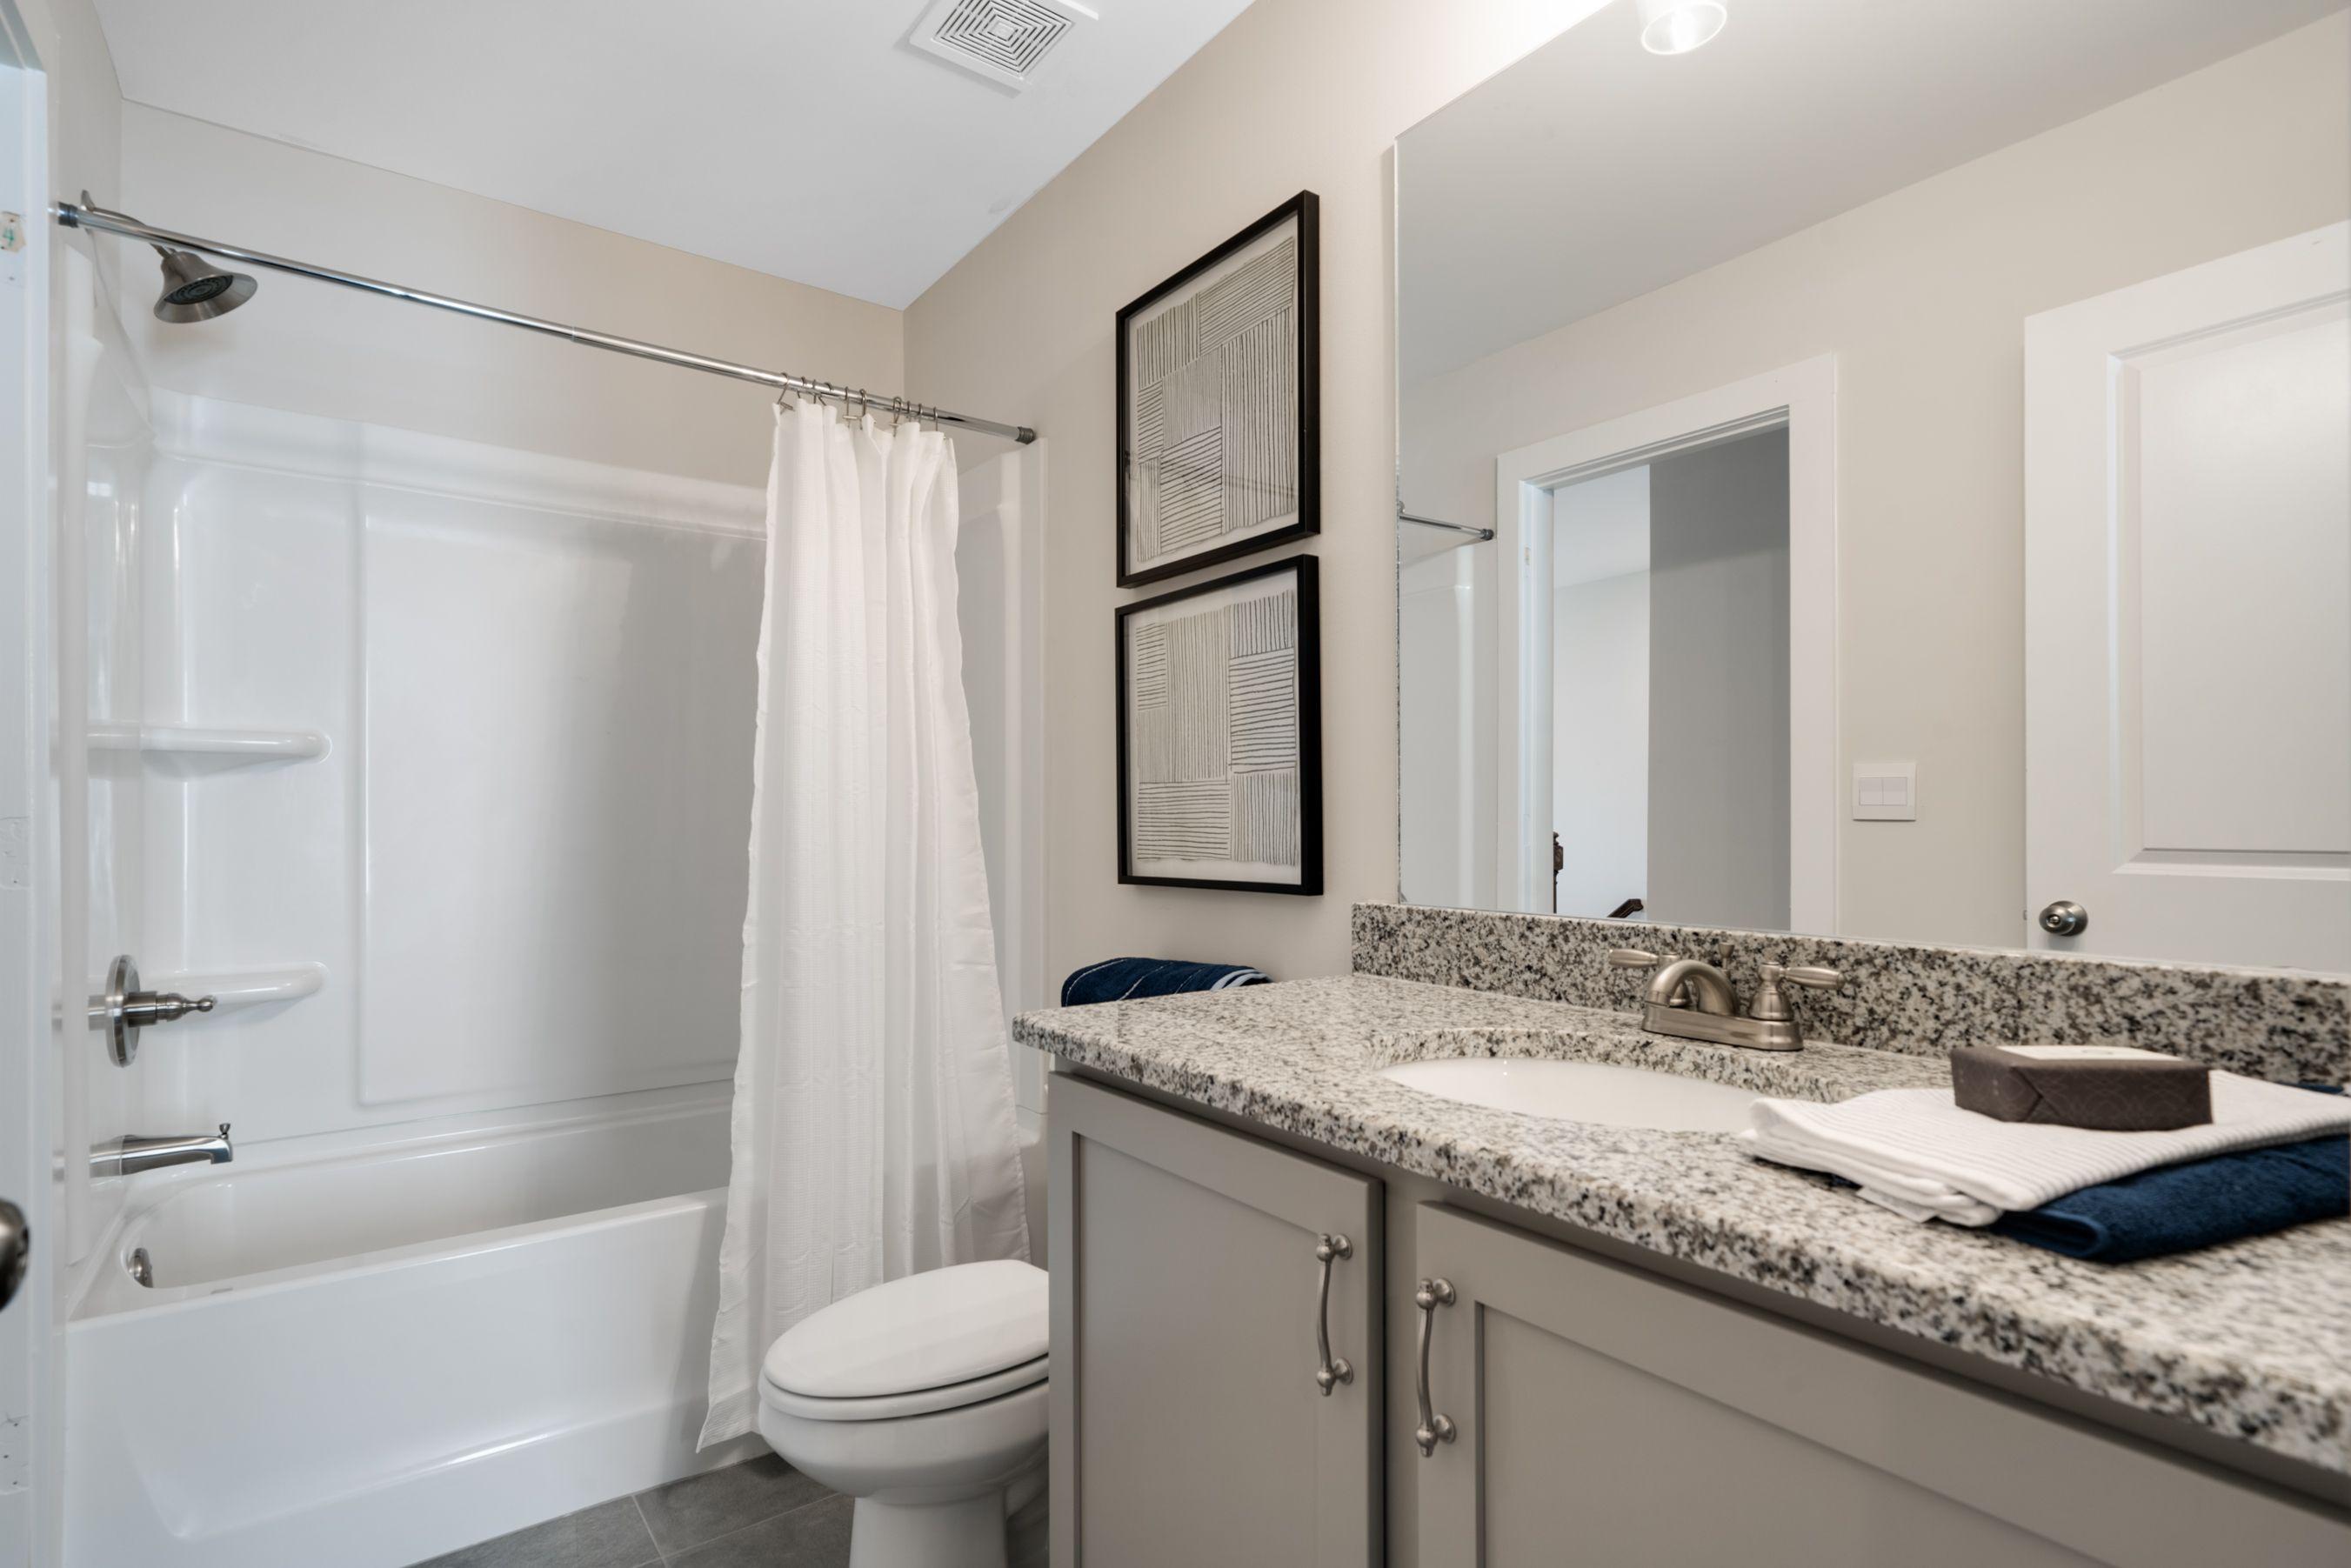 Bathroom featured in the Dalton (Farmhouse Series) By Artisan Built Communities in Atlanta, GA